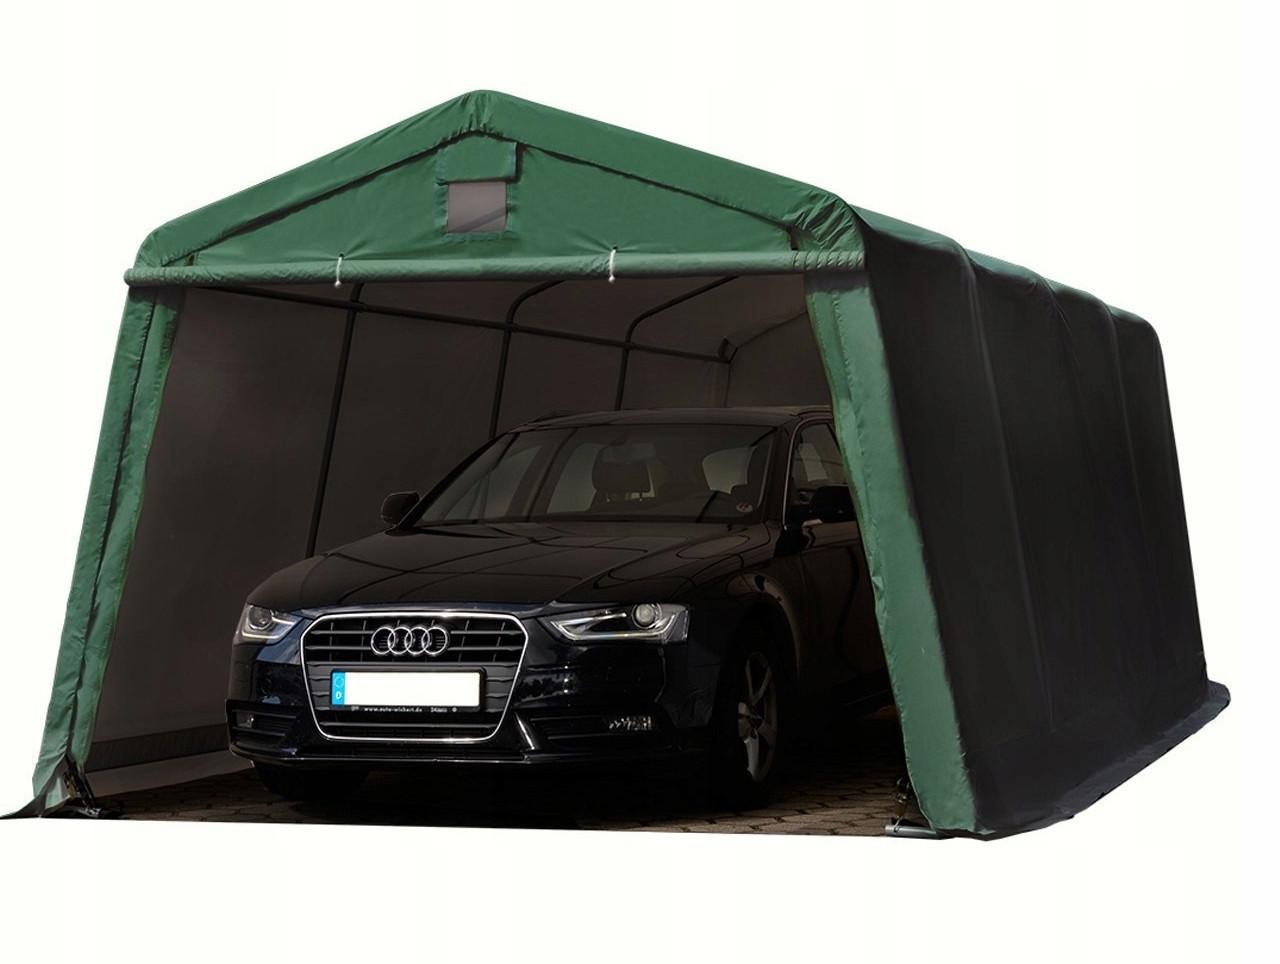 Павильон гаражный 3,3x8,4 м ПВХ 550 г/м² (Зеленый)